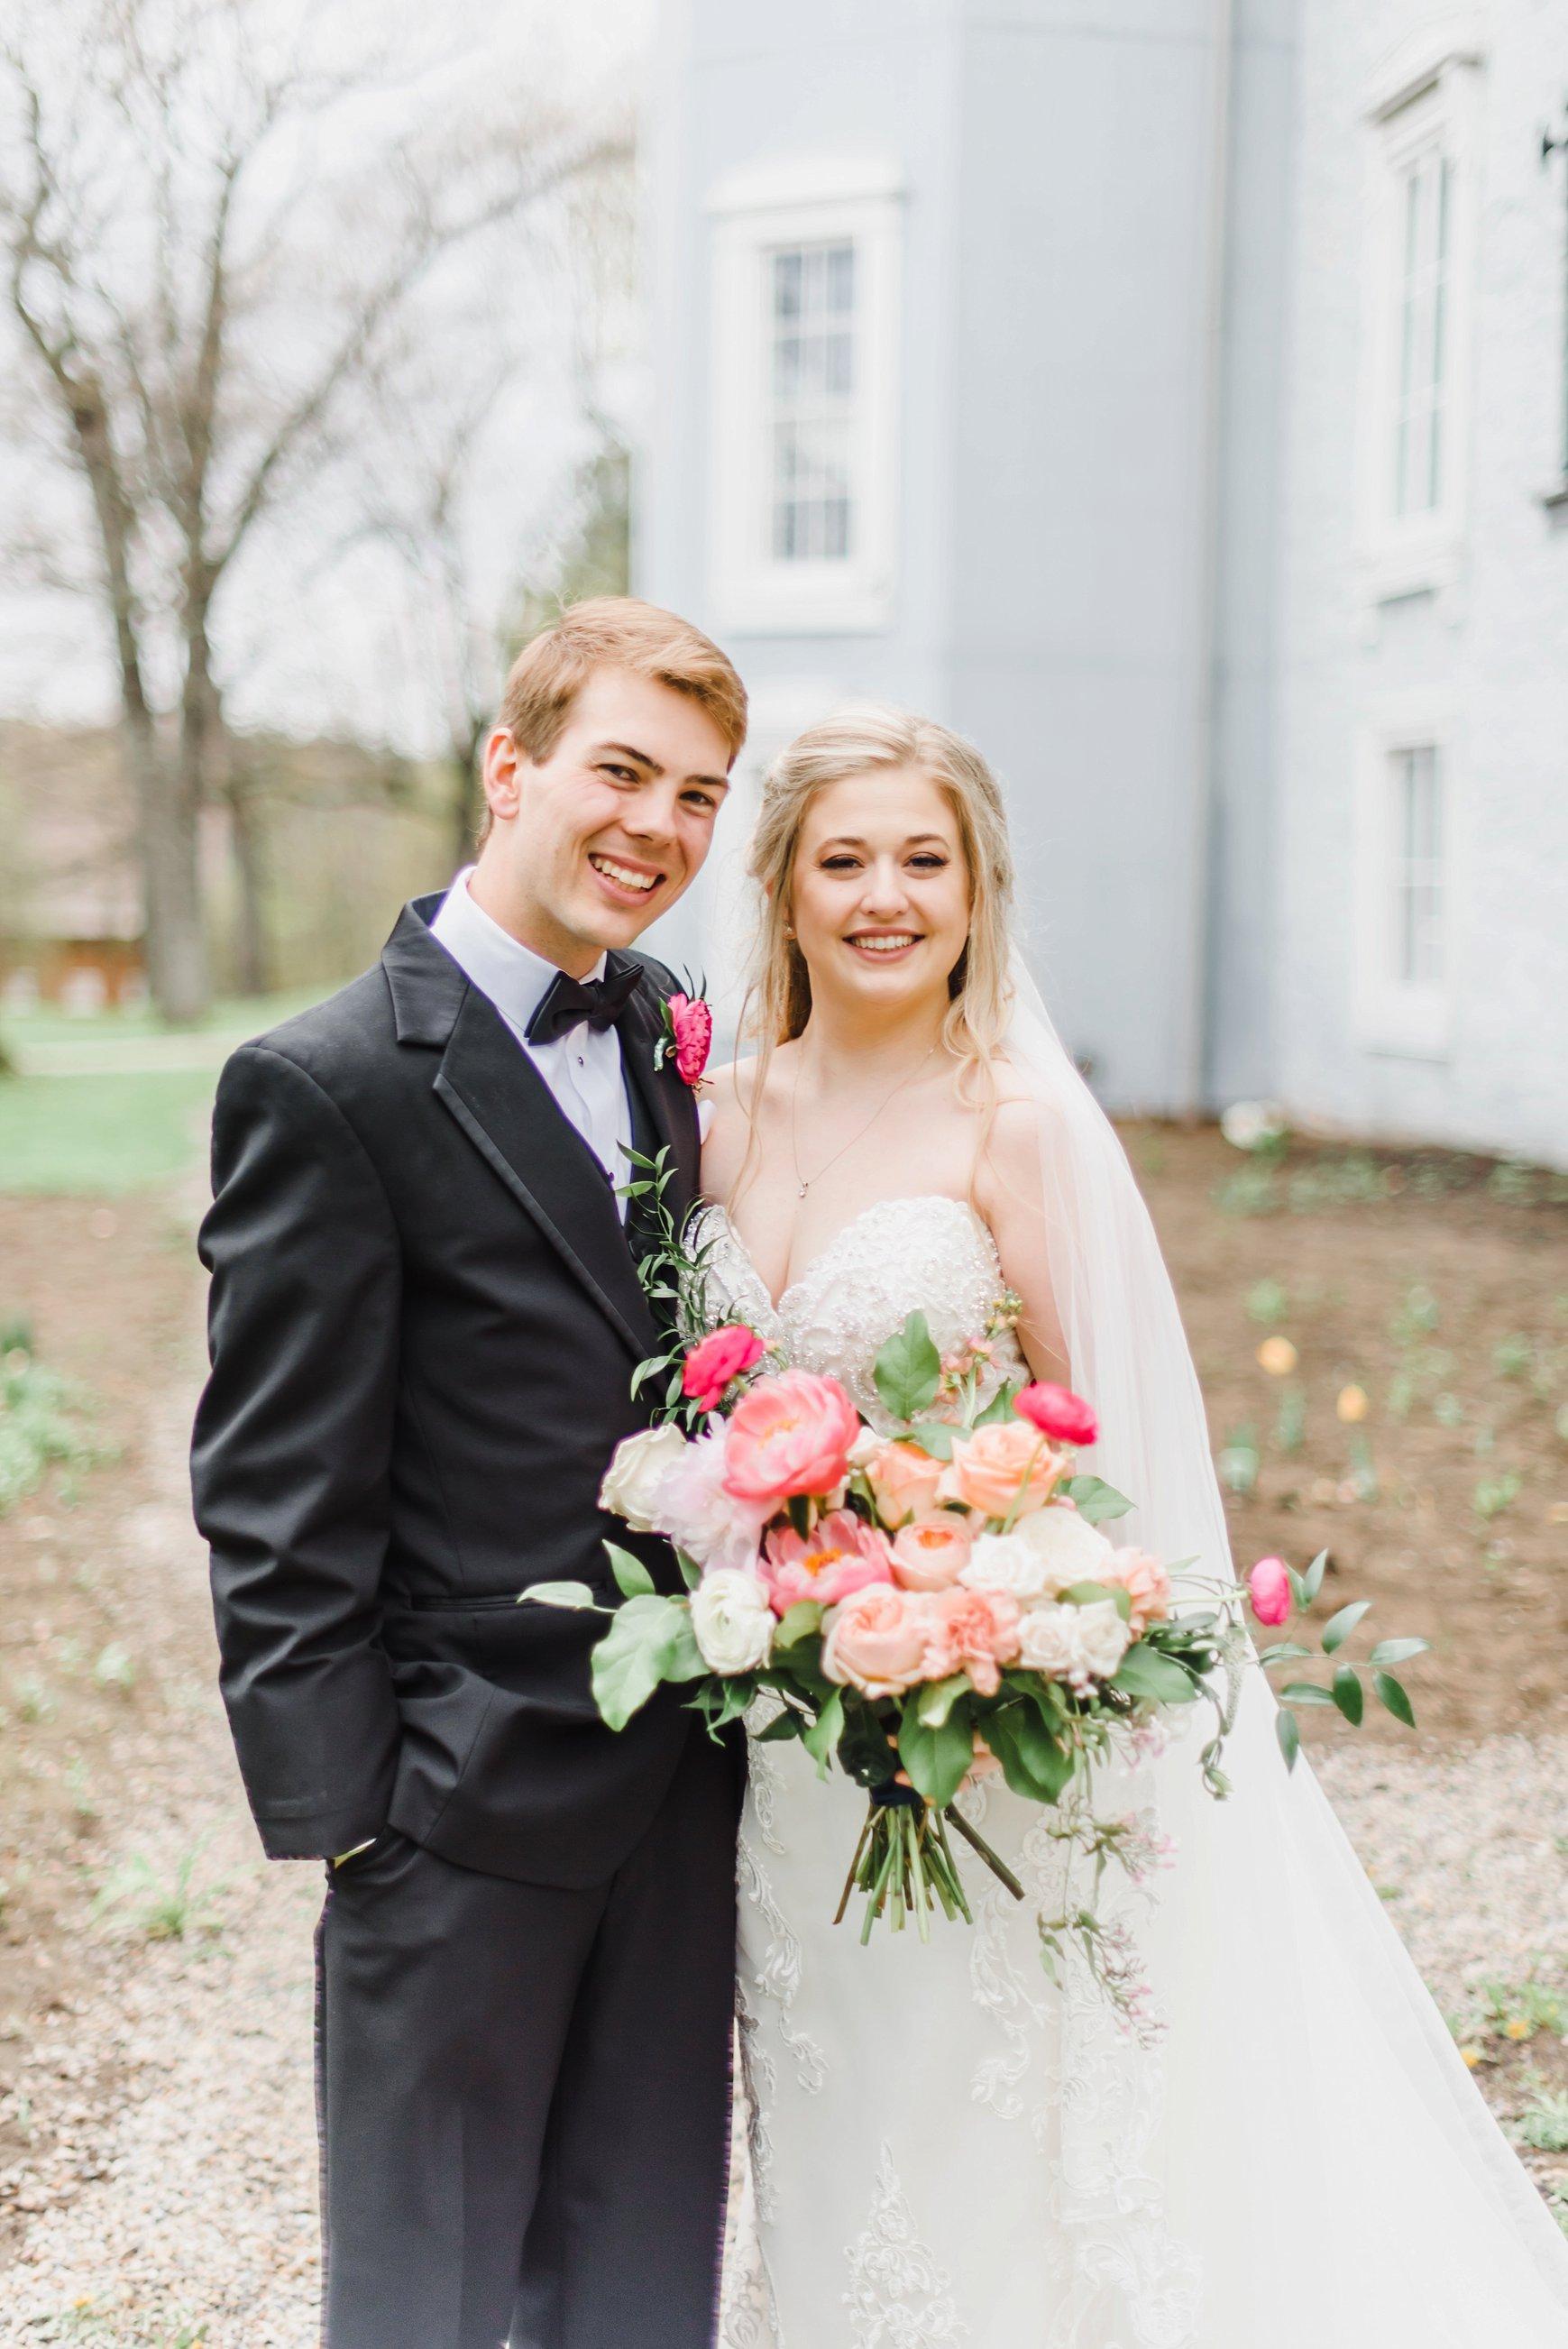 light airy indie fine art ottawa wedding photographer | Ali and Batoul Photography_0190.jpg